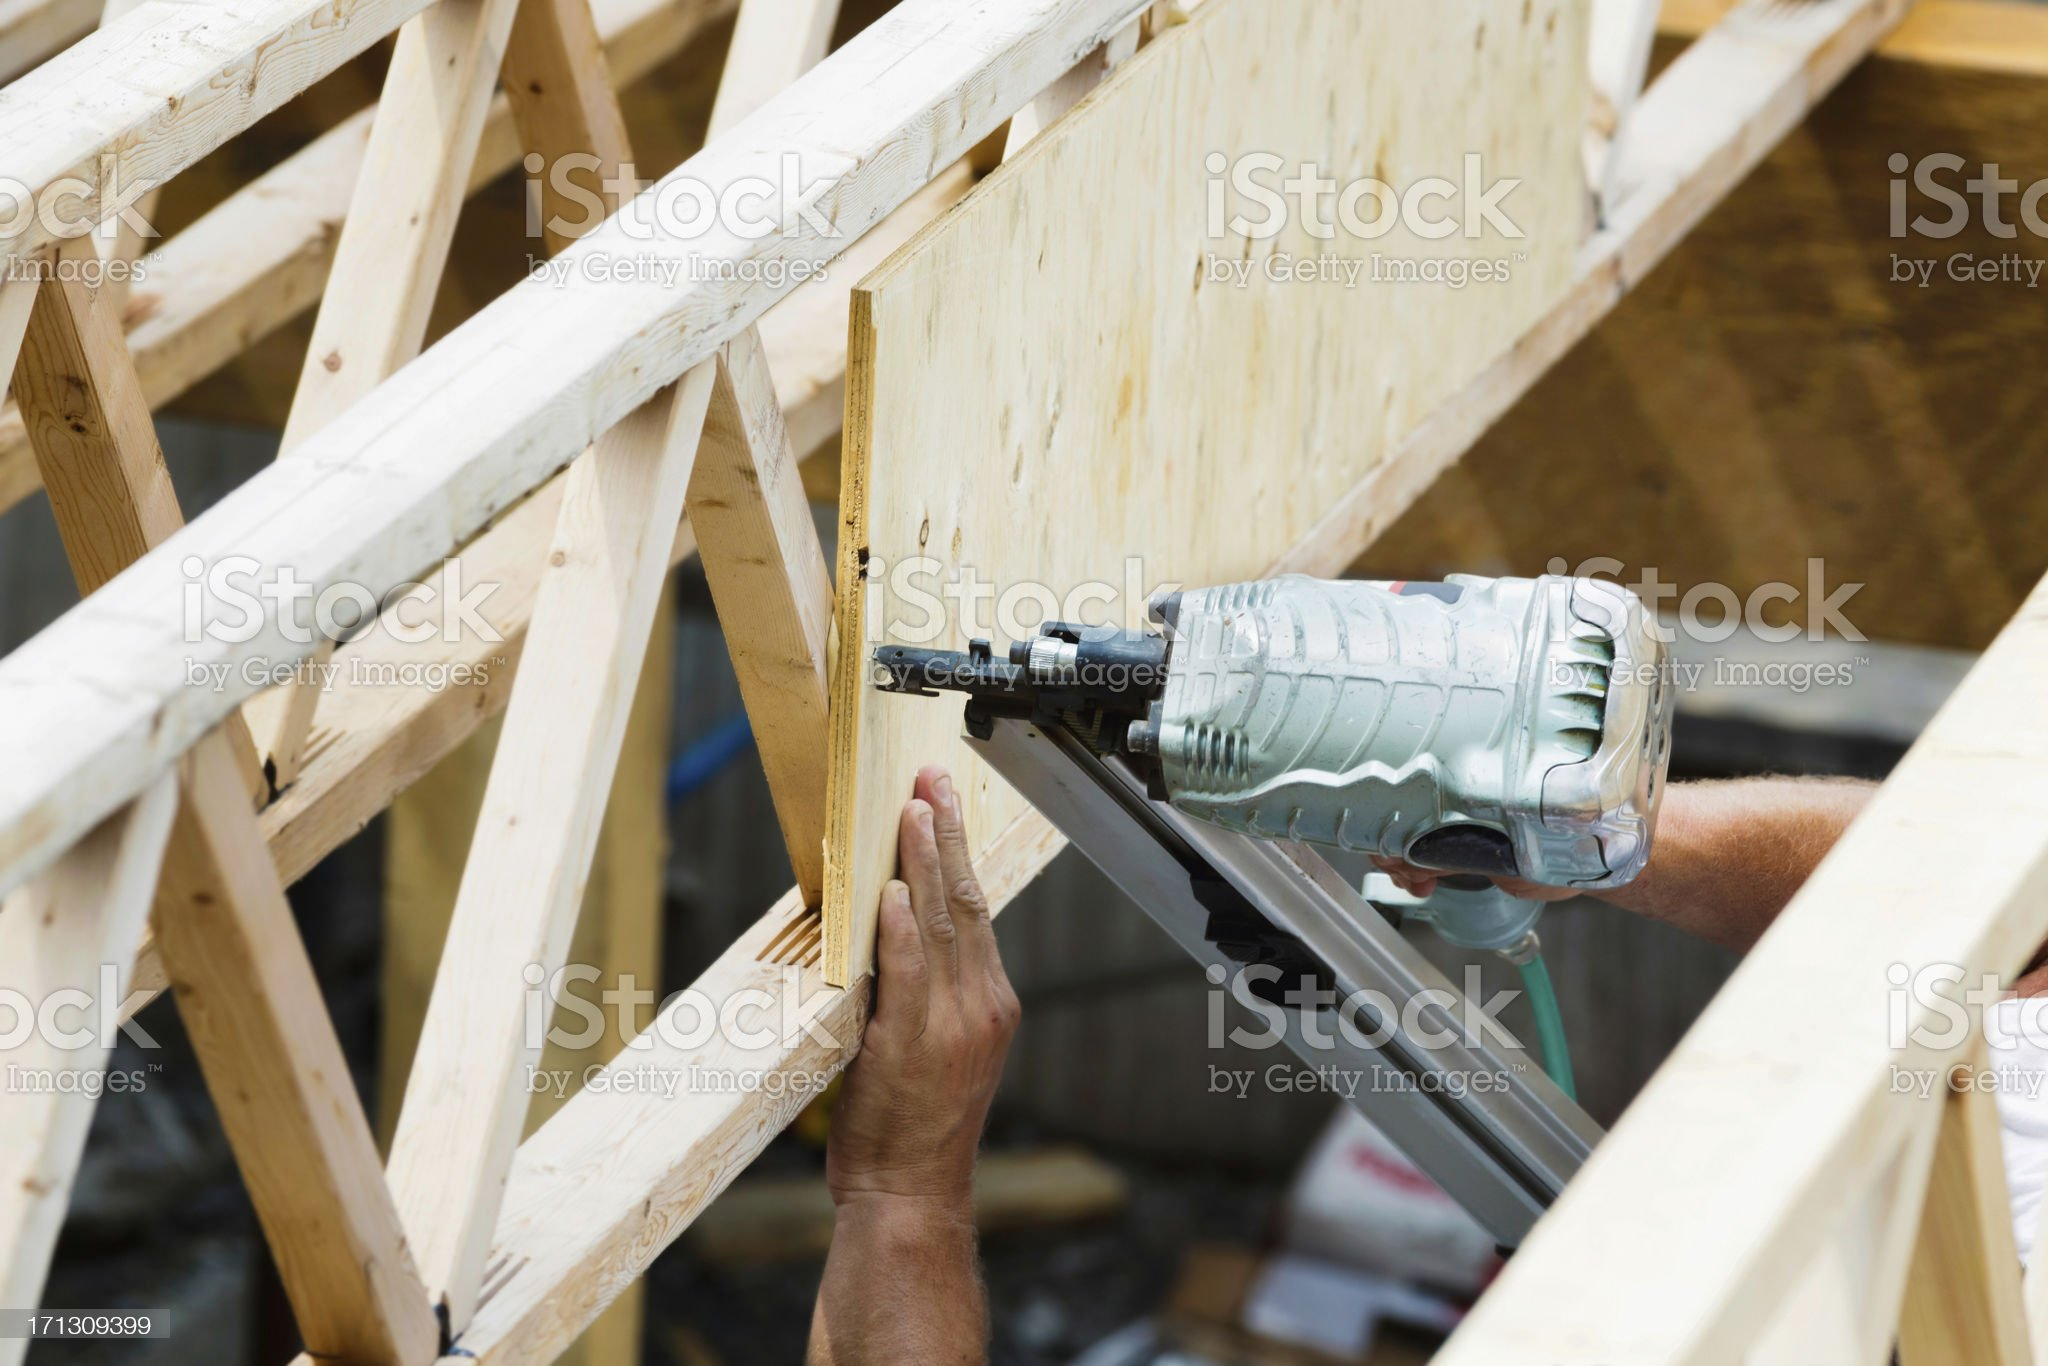 Nail Gun on construction site royalty-free stock photo